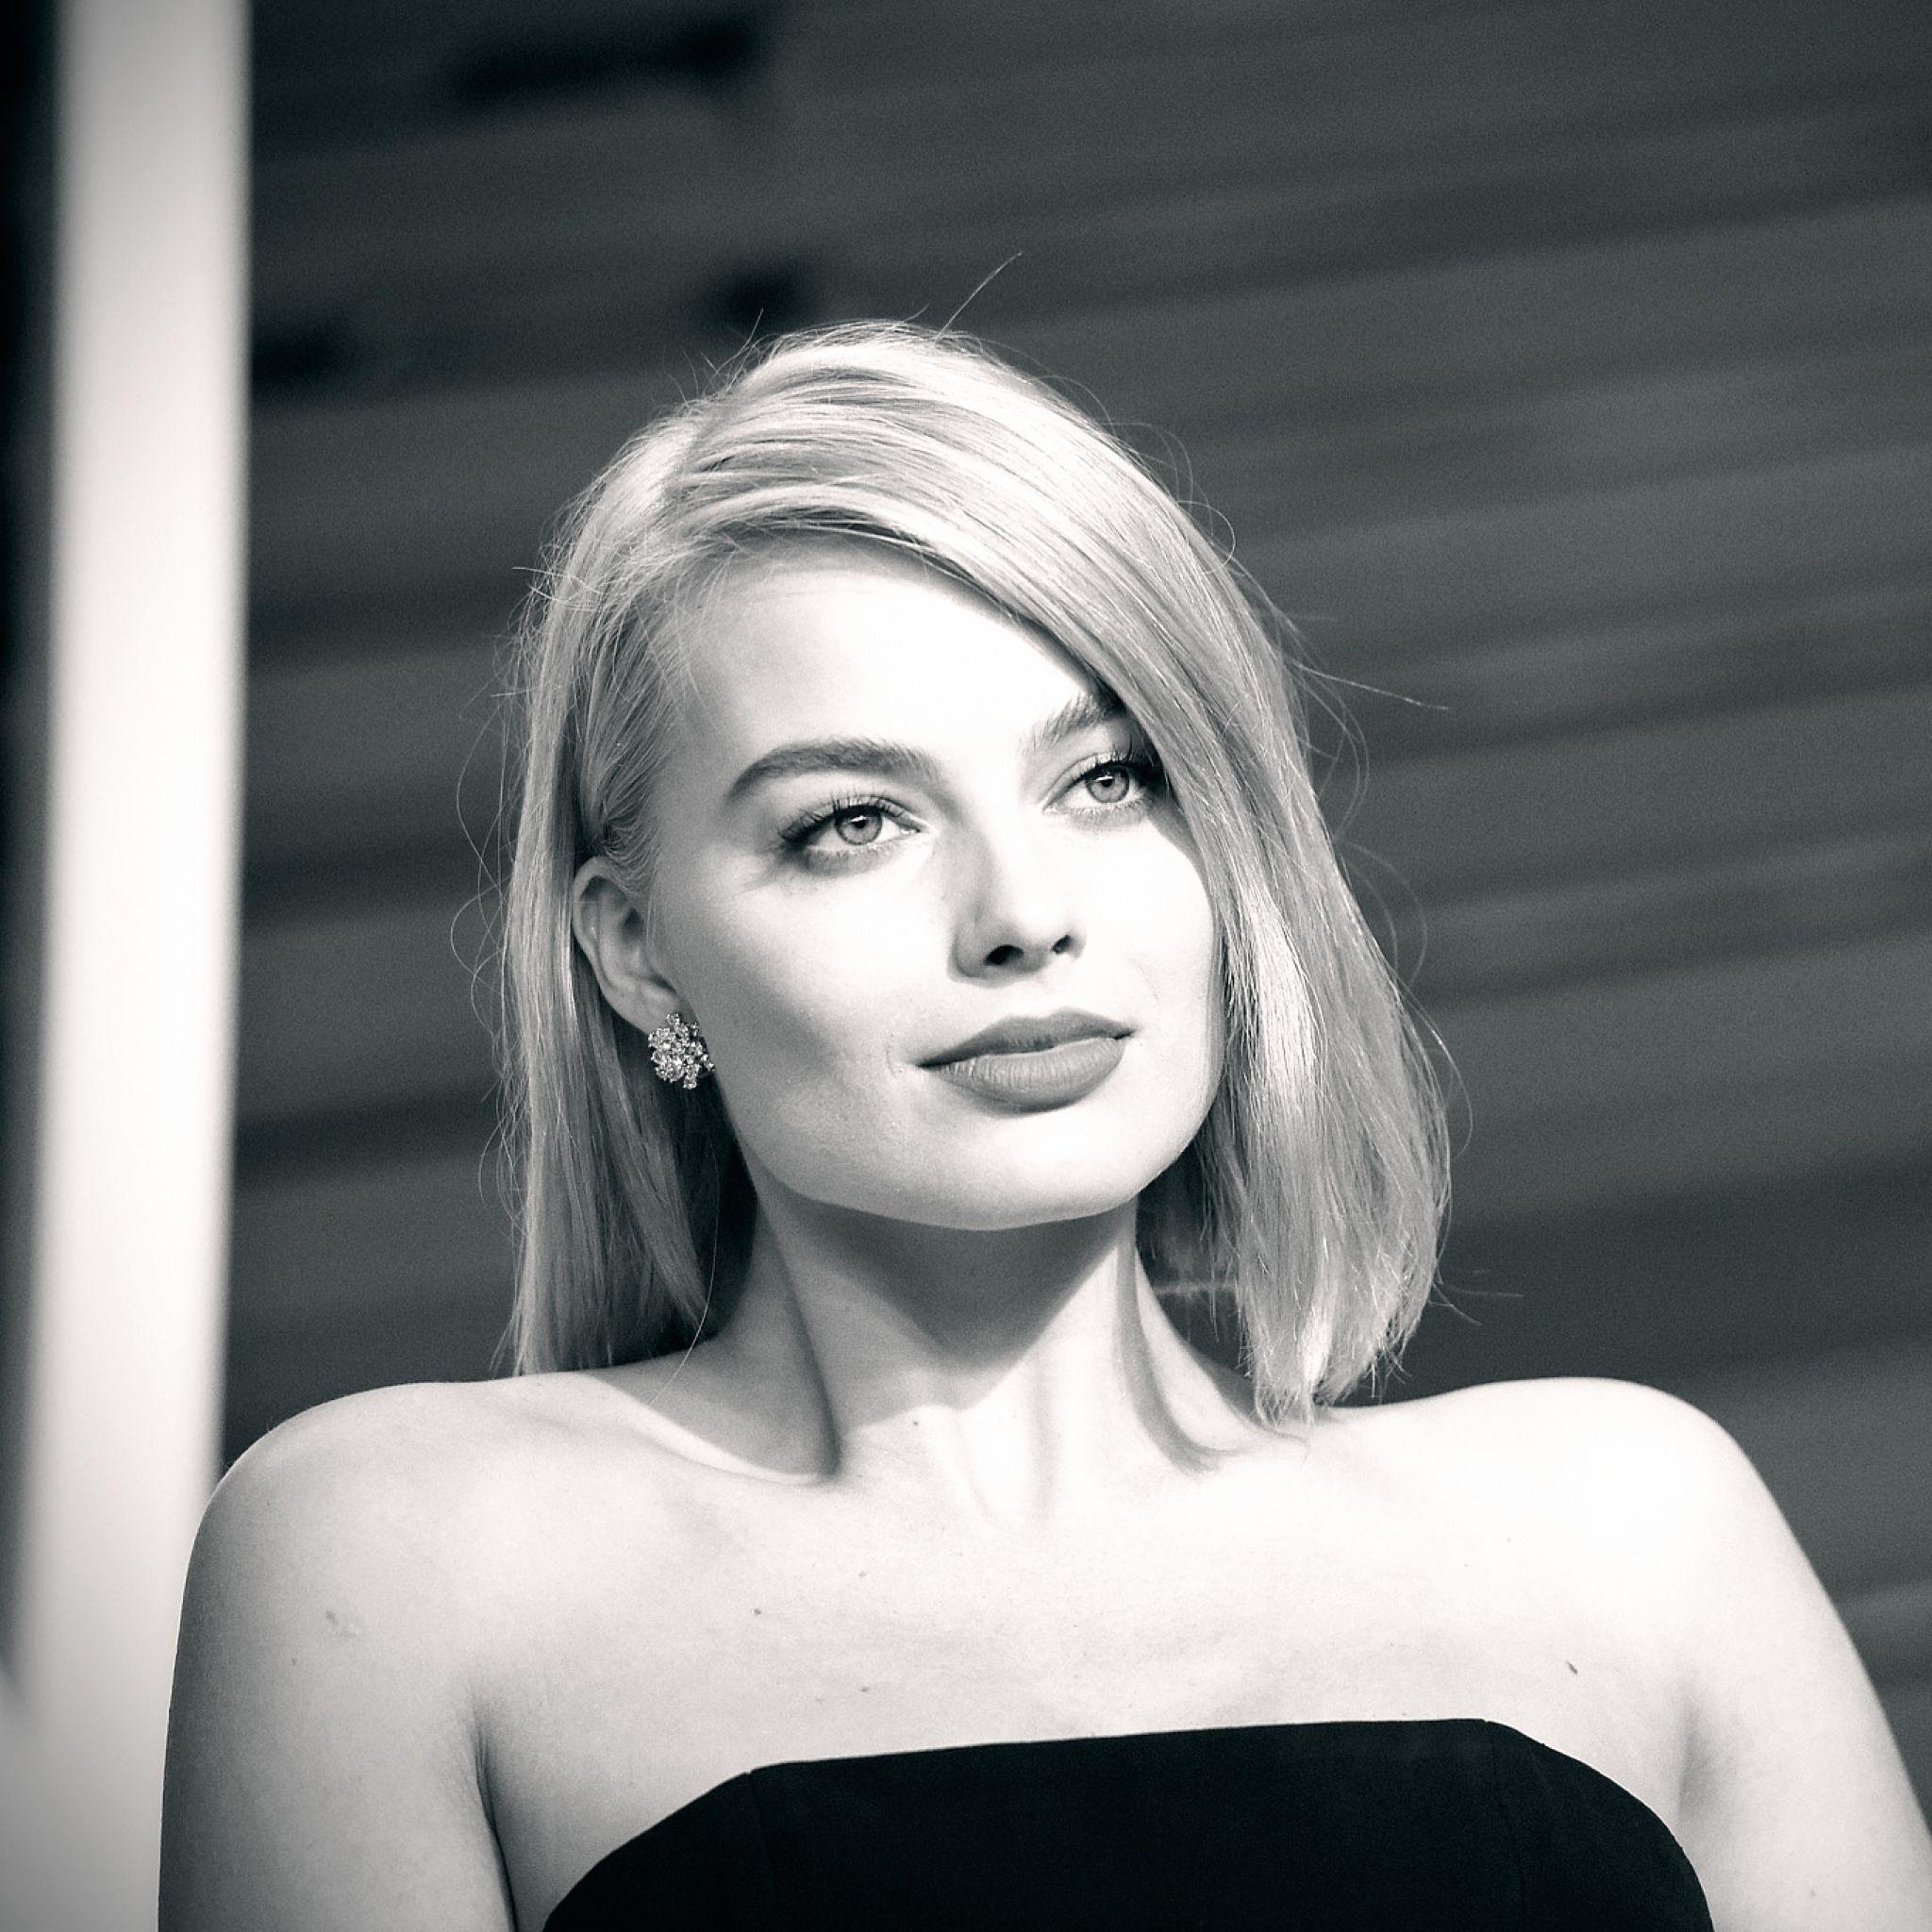 10 Best Margot Robbie Wallpaper Hd FULL HD 1080p For PC